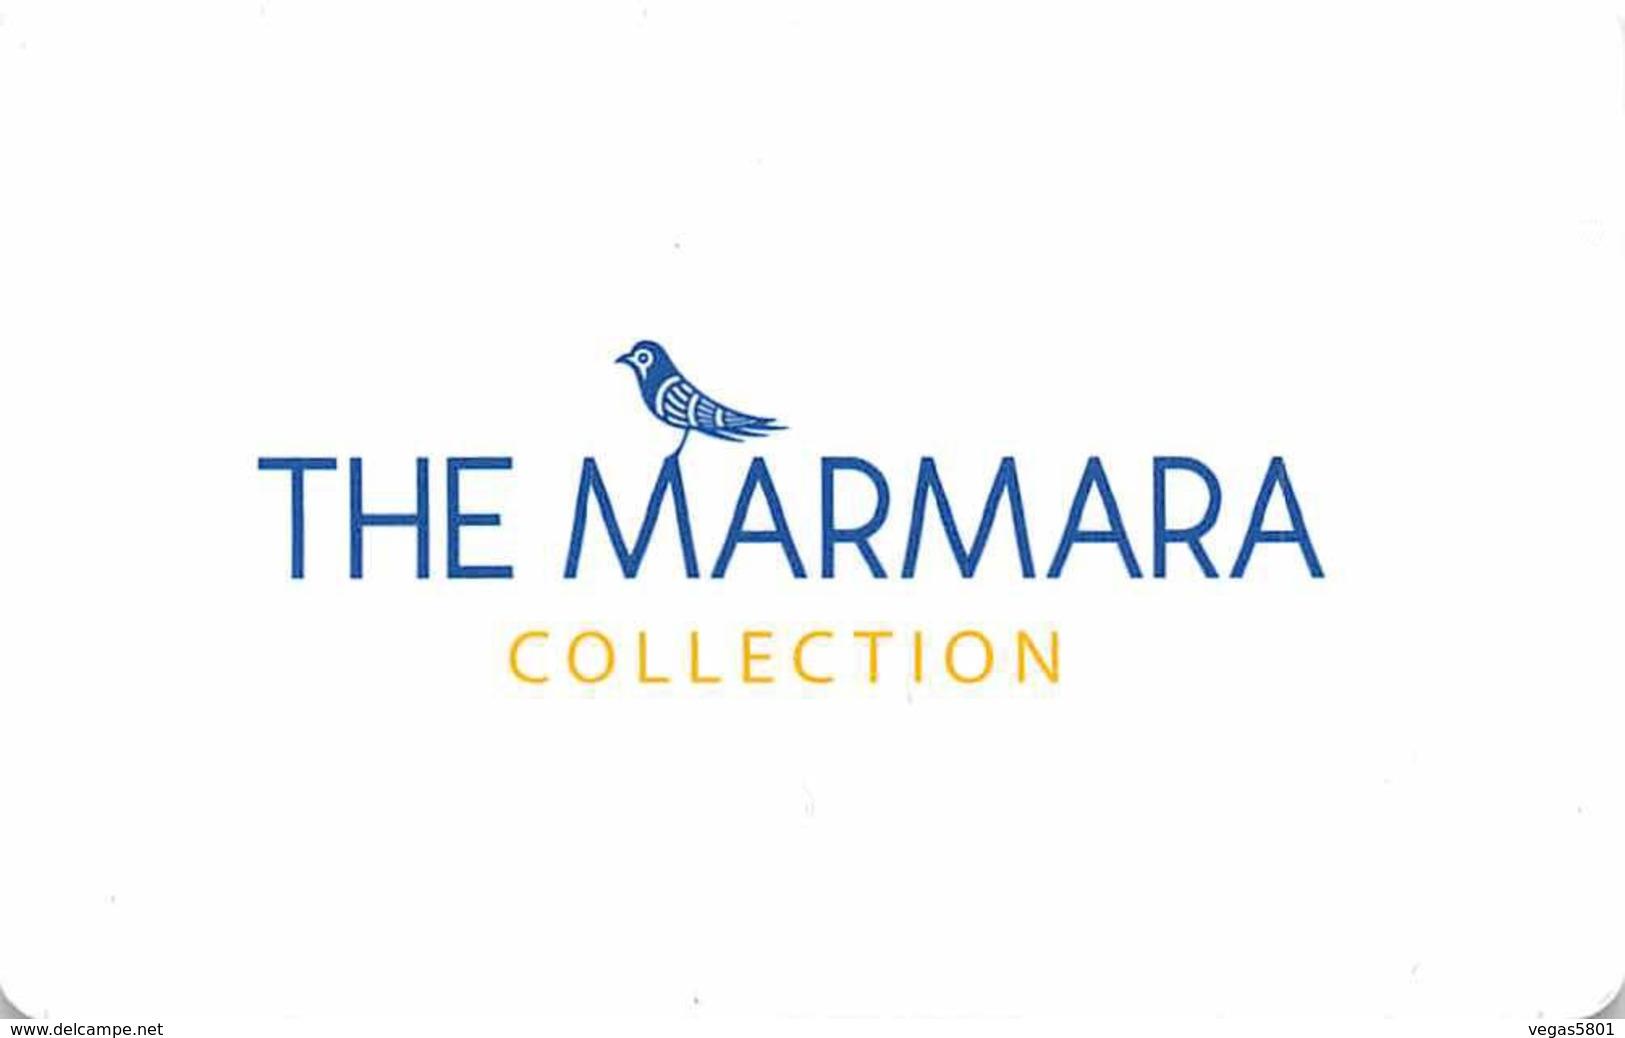 THE MARMARA COLLECTION - Turkey - Hotel Room Key Card, Hotelkarte, Schlüsselkarte, Clé De L'Hôtel - Hotelkarten